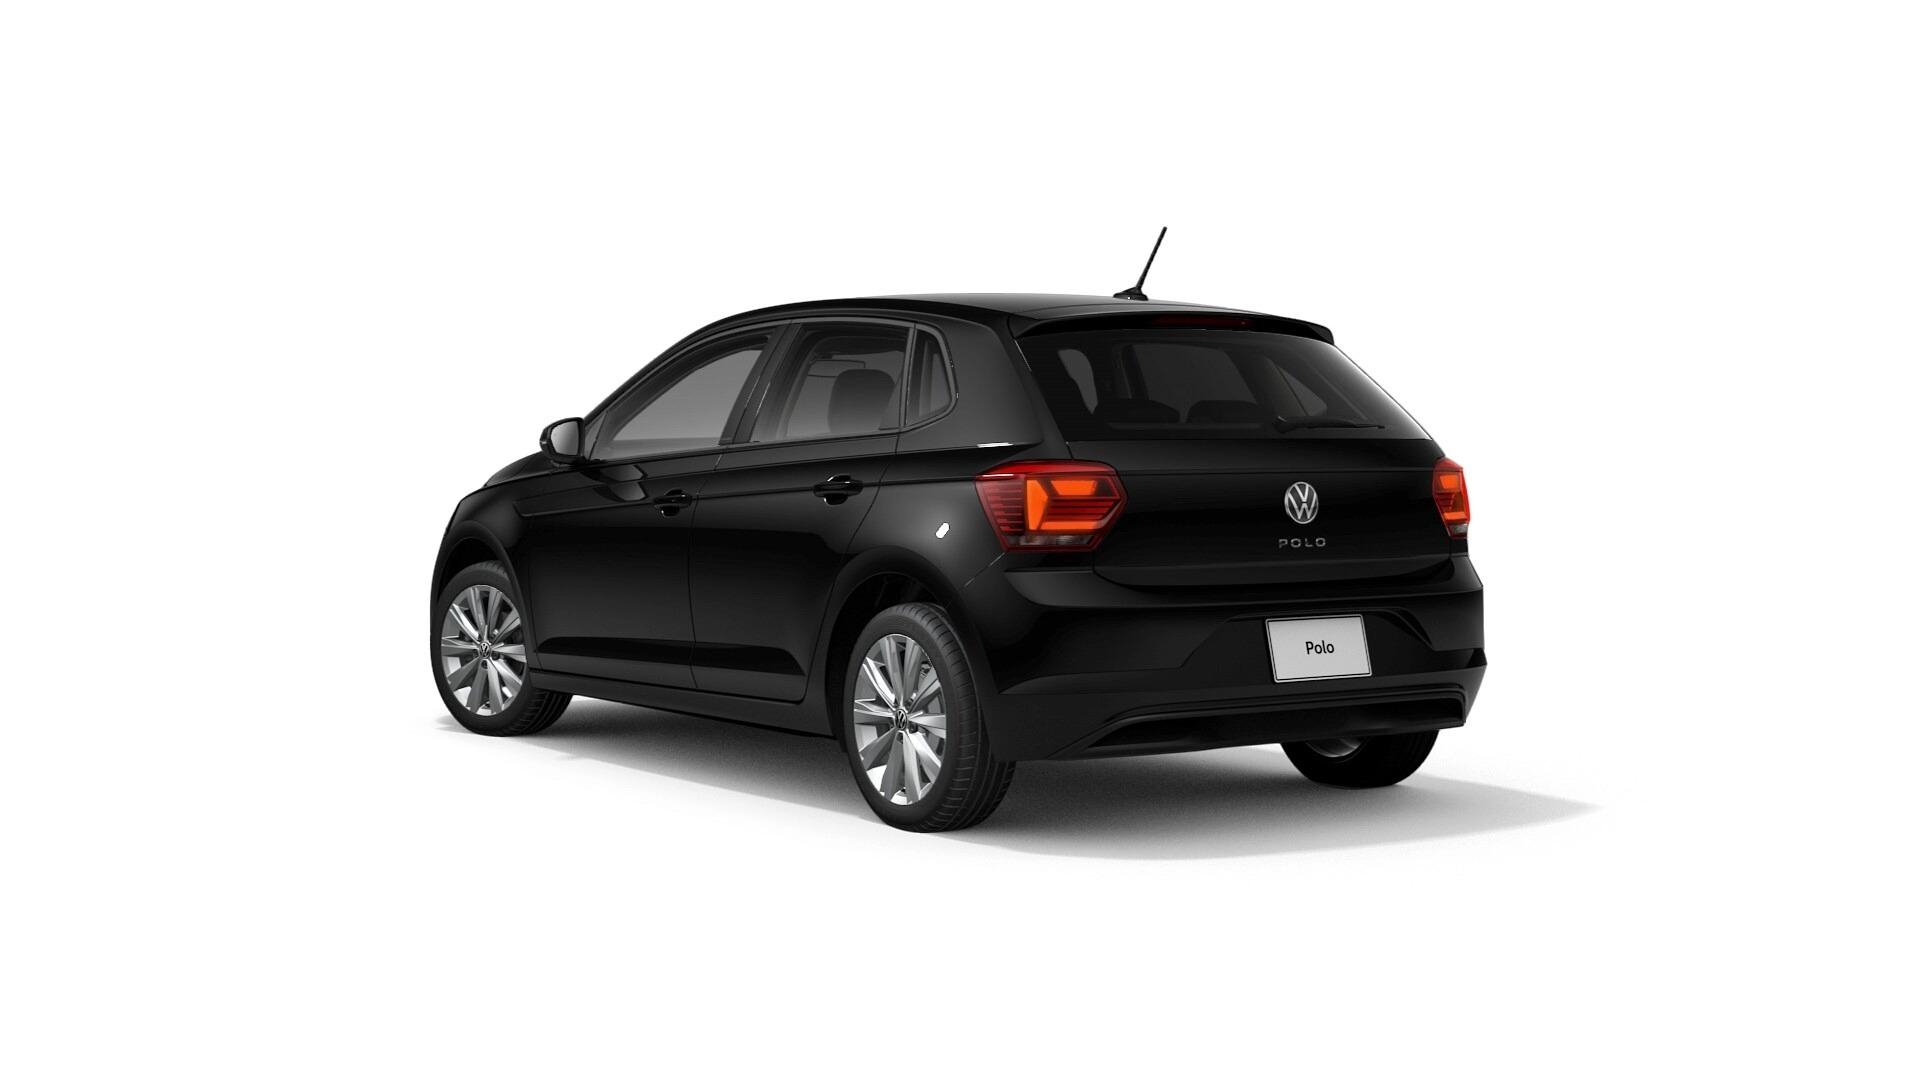 Polo TSI Highline純正ナビ・セーフティパッケージ・テクノロジーパッケージ装着車の画像2